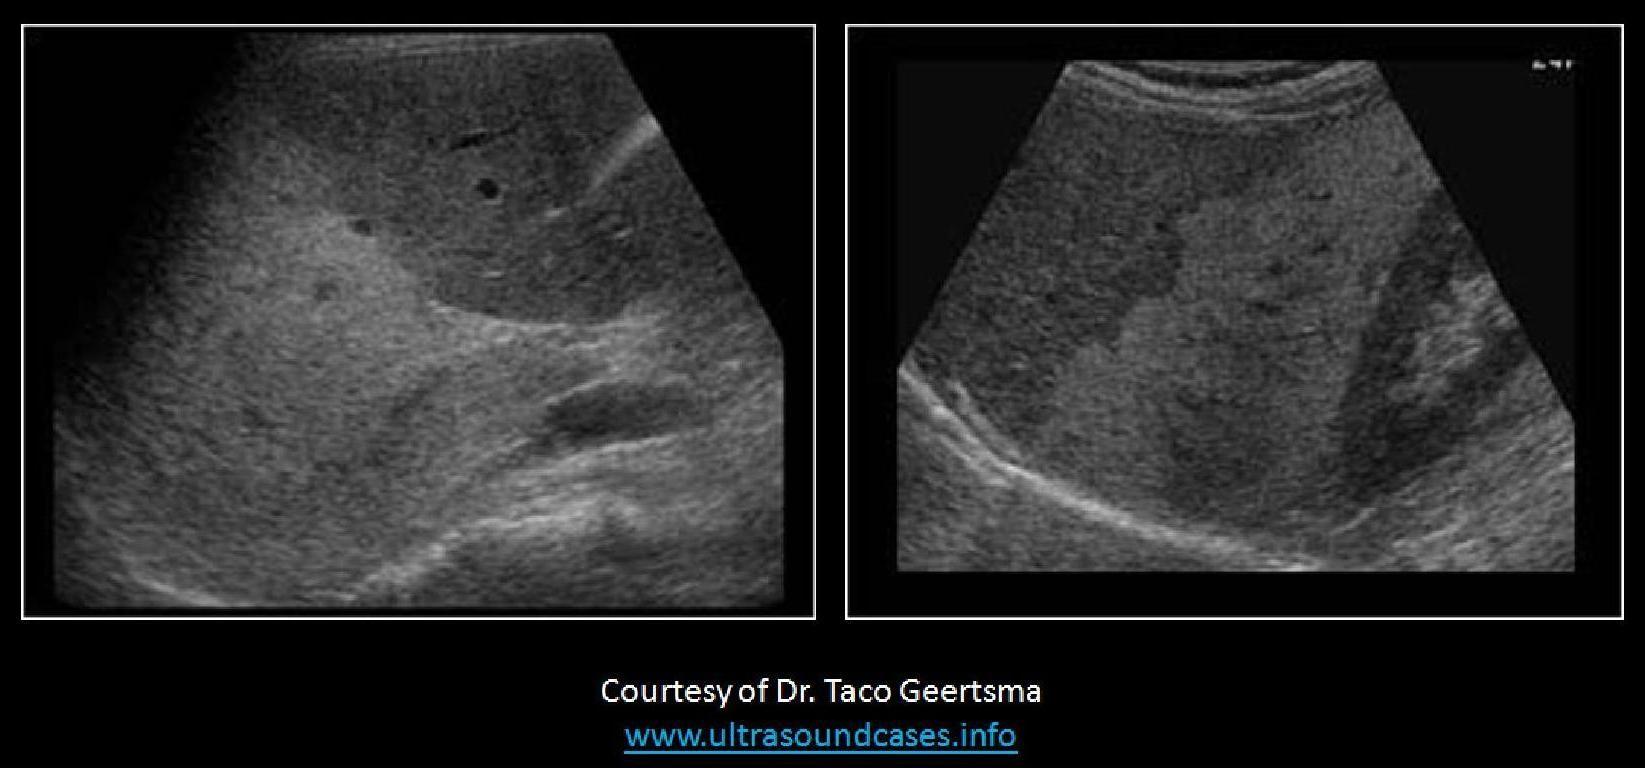 WK 2 LIVER PATHOLOGY Fatty infiltration | Ultrasound | Pinterest ...